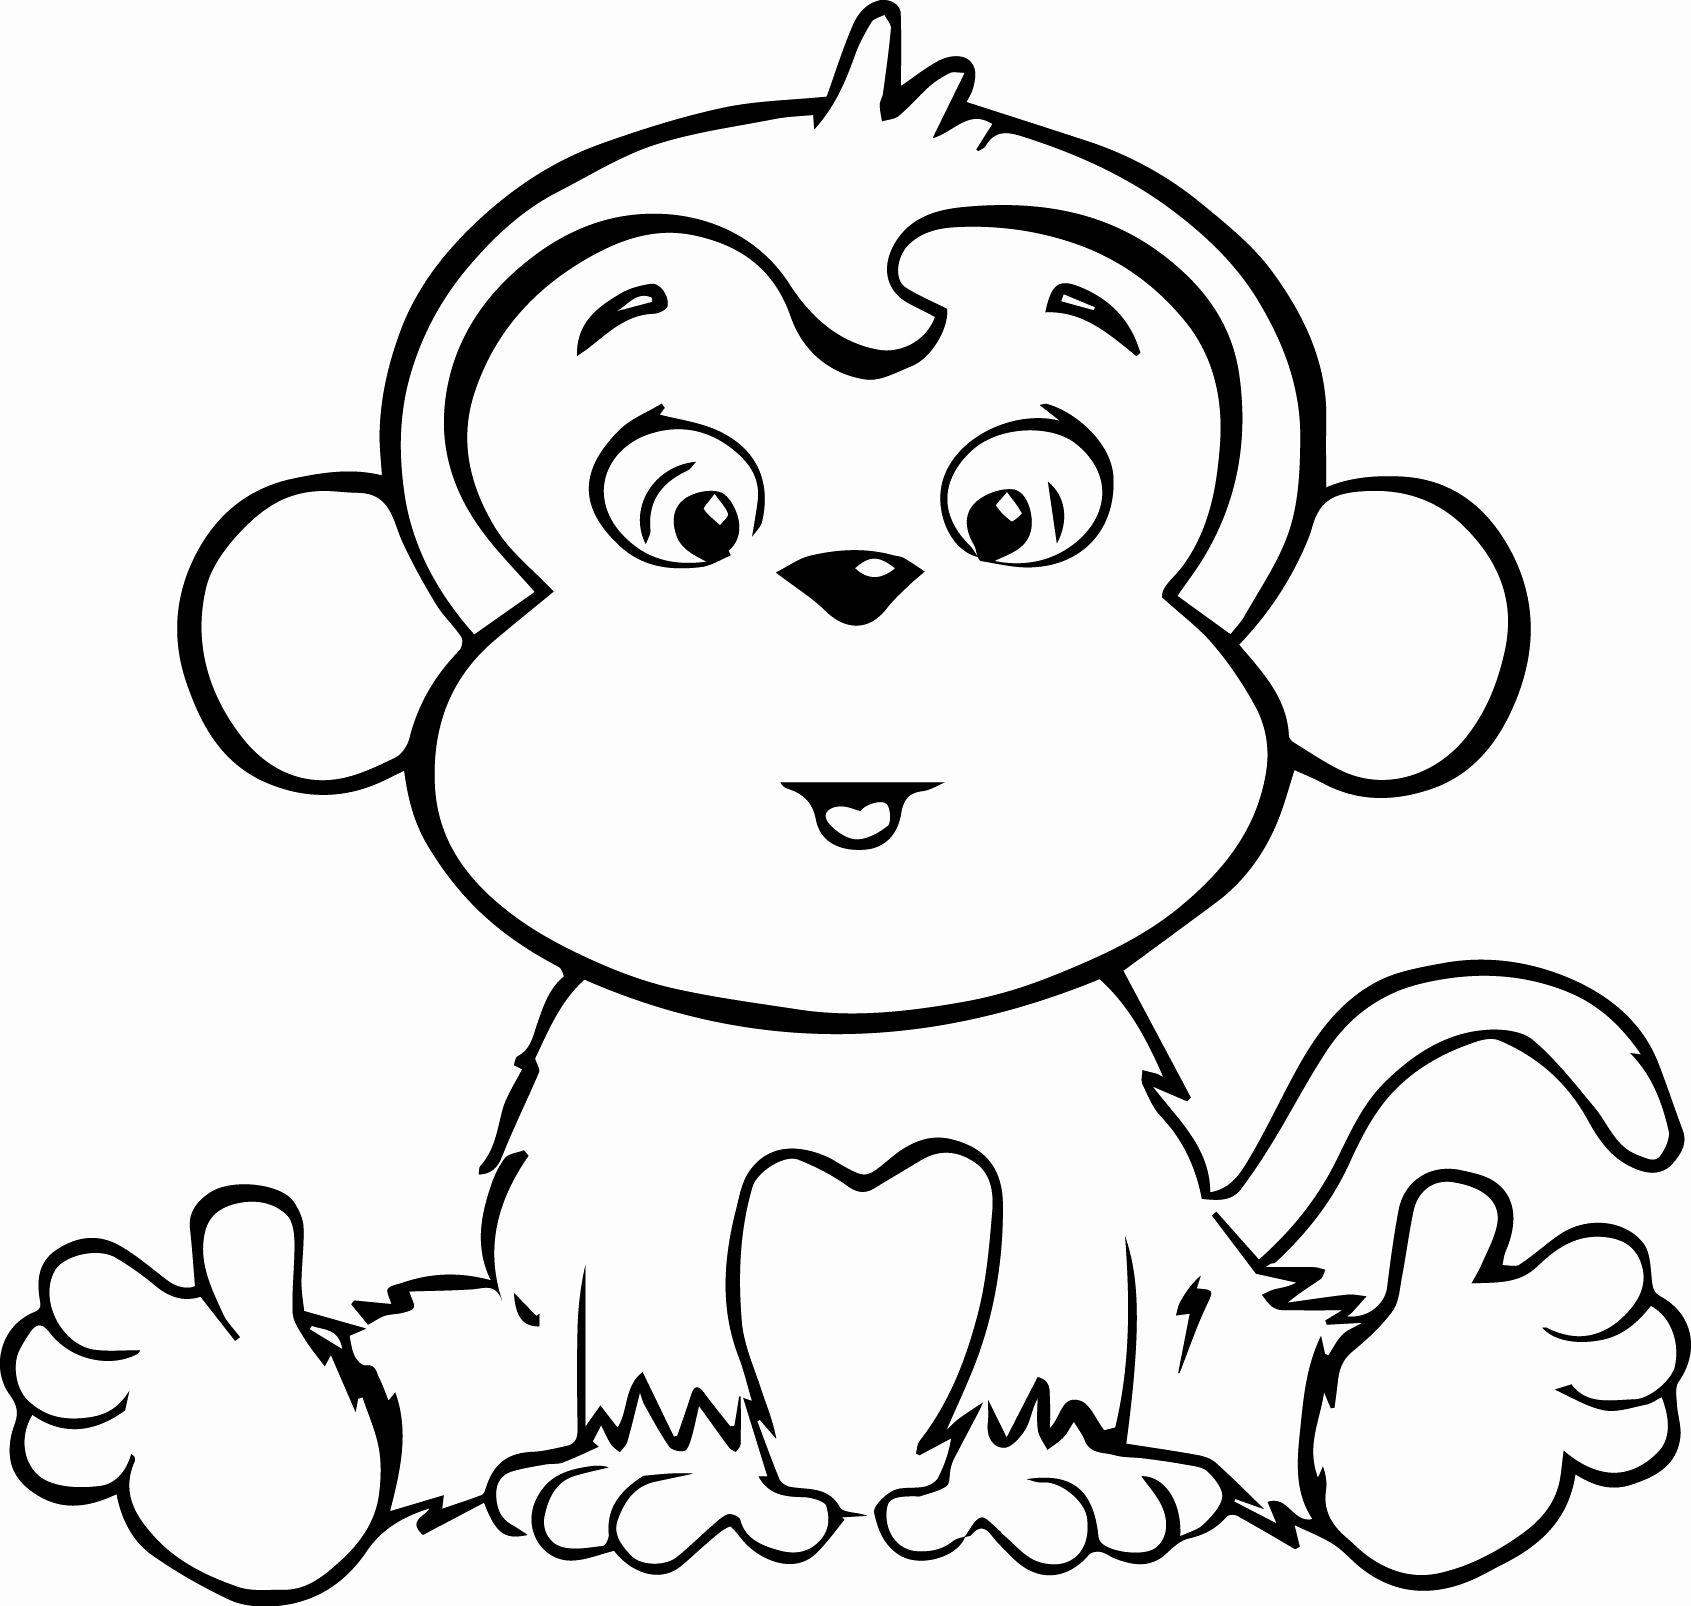 Printable Monkey Coloring Pages Unique Cute Baby Monkey Coloring Pages Printables Coloring Hom Monkey Coloring Pages Cartoon Coloring Pages Cute Coloring Pages